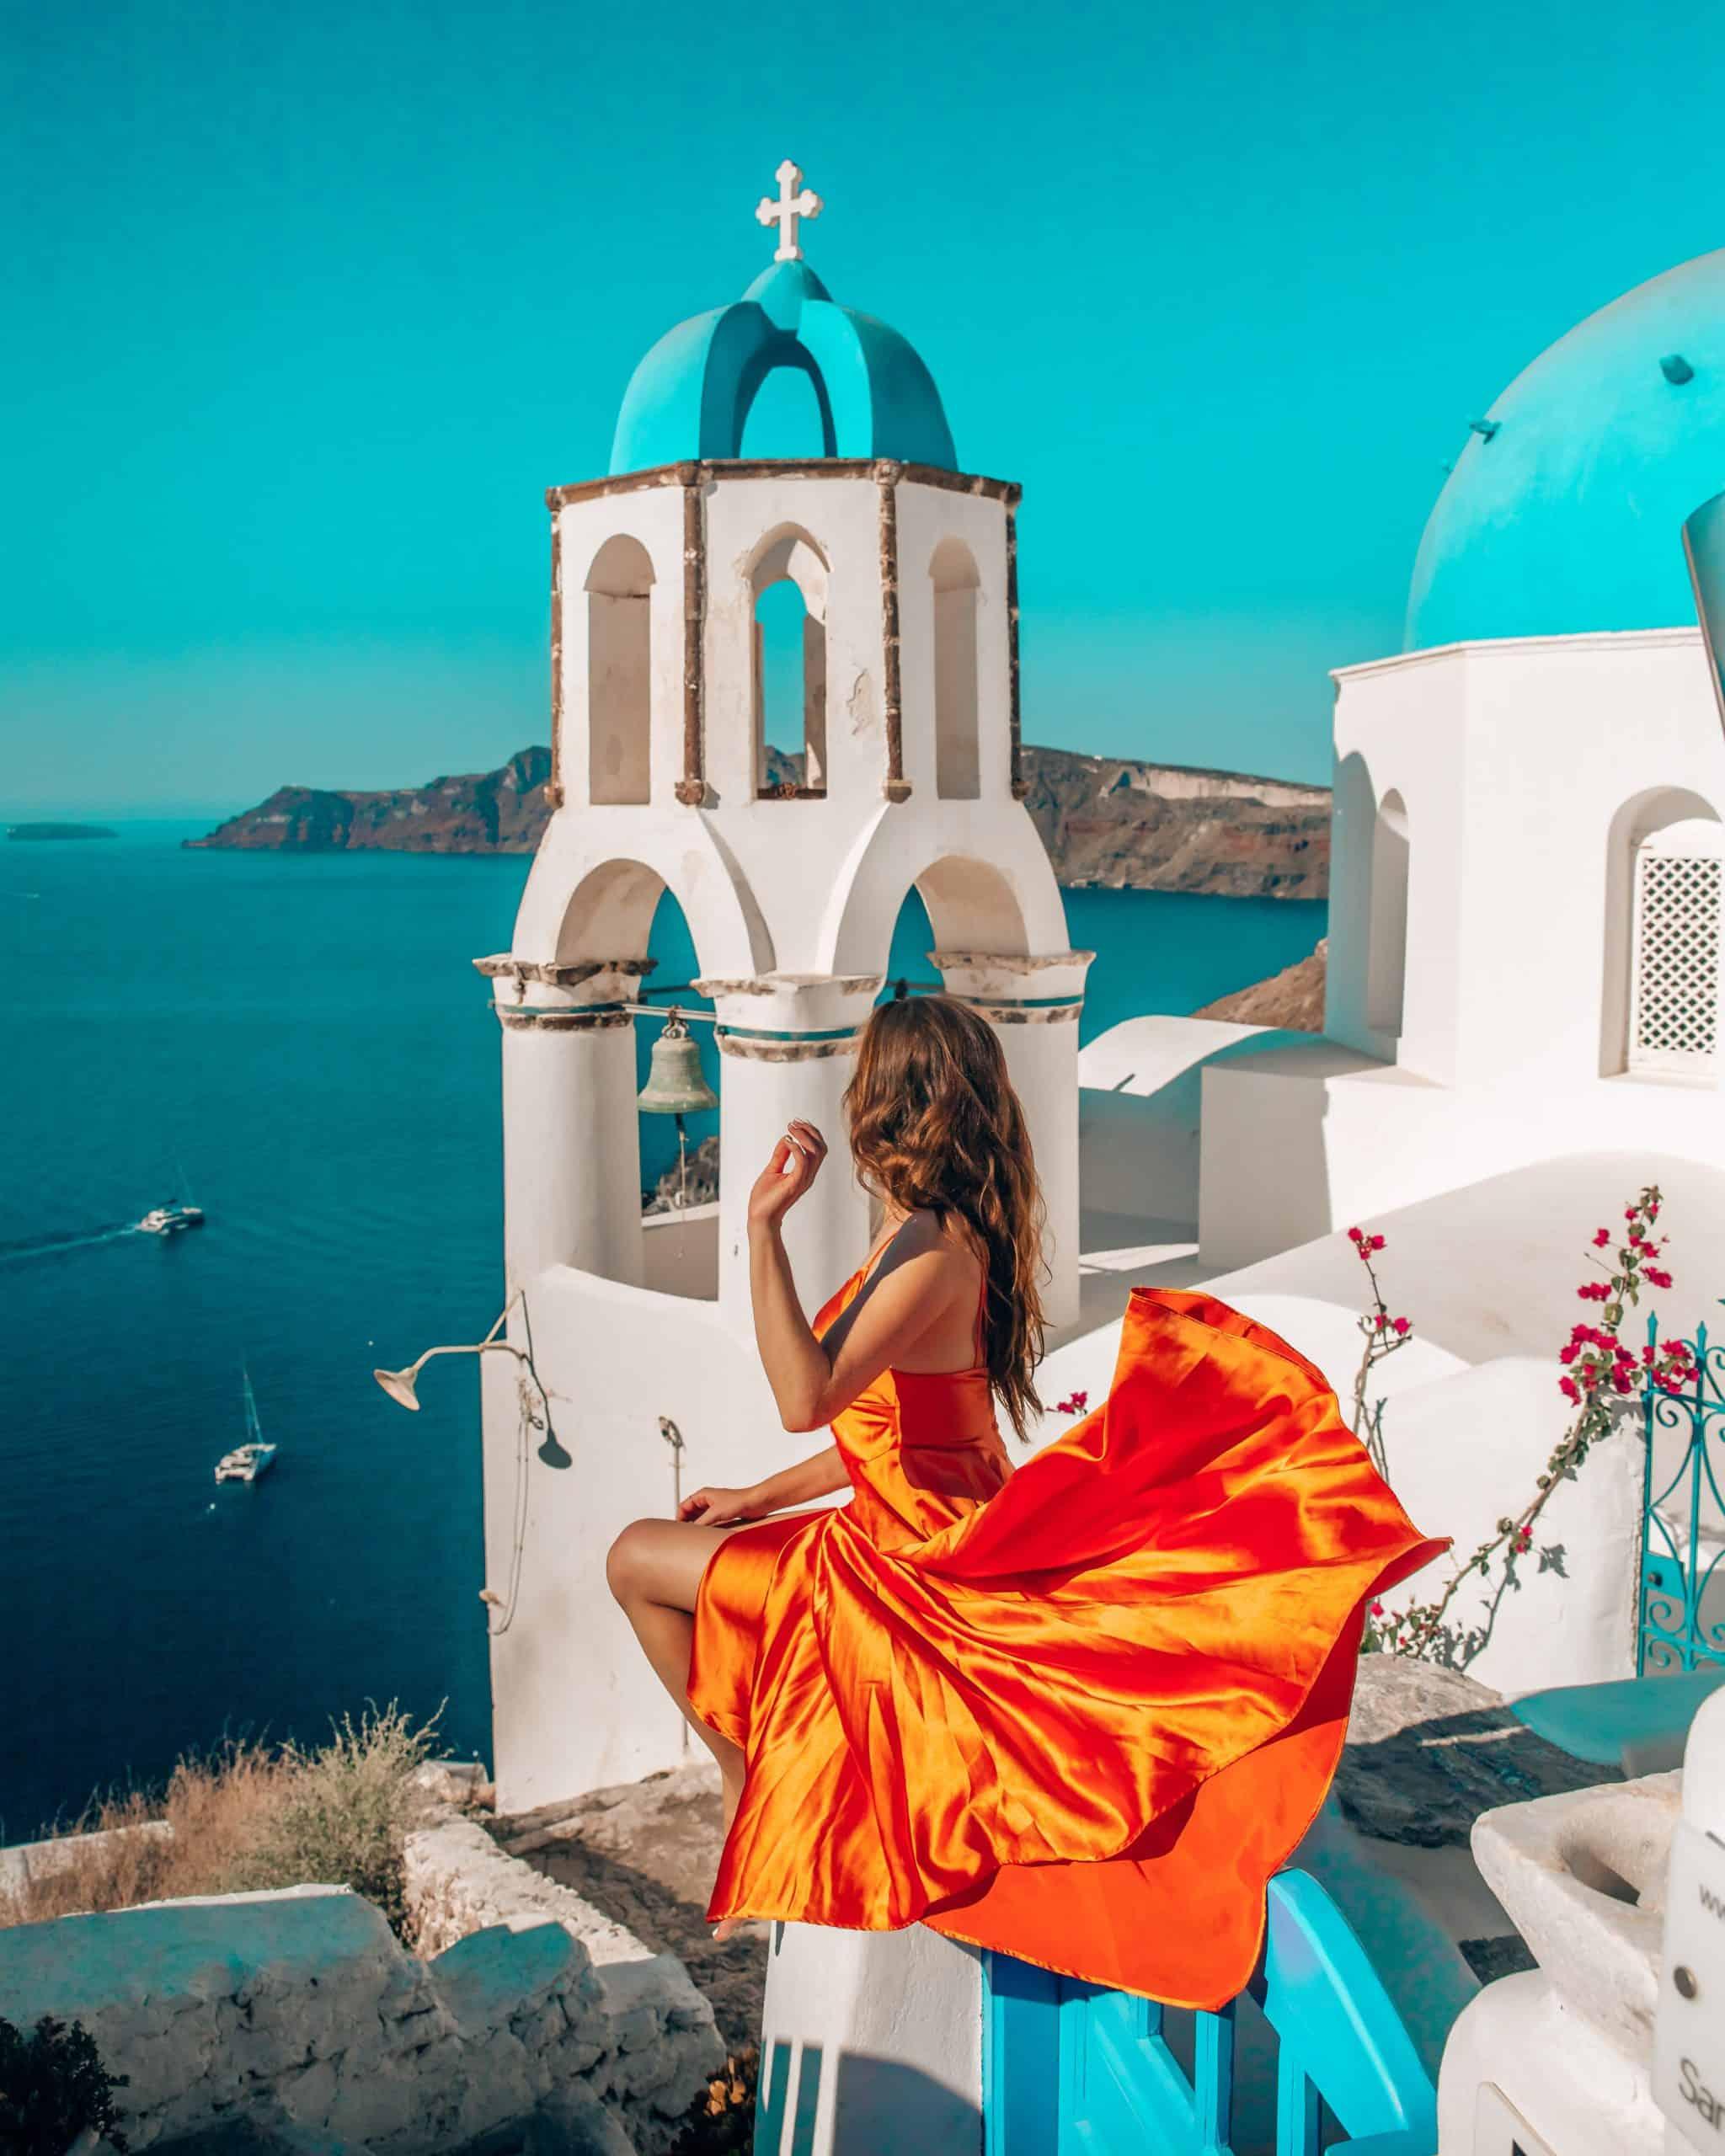 Bettina in Orange Dress at Blue Dome Church in Oia, Santorini